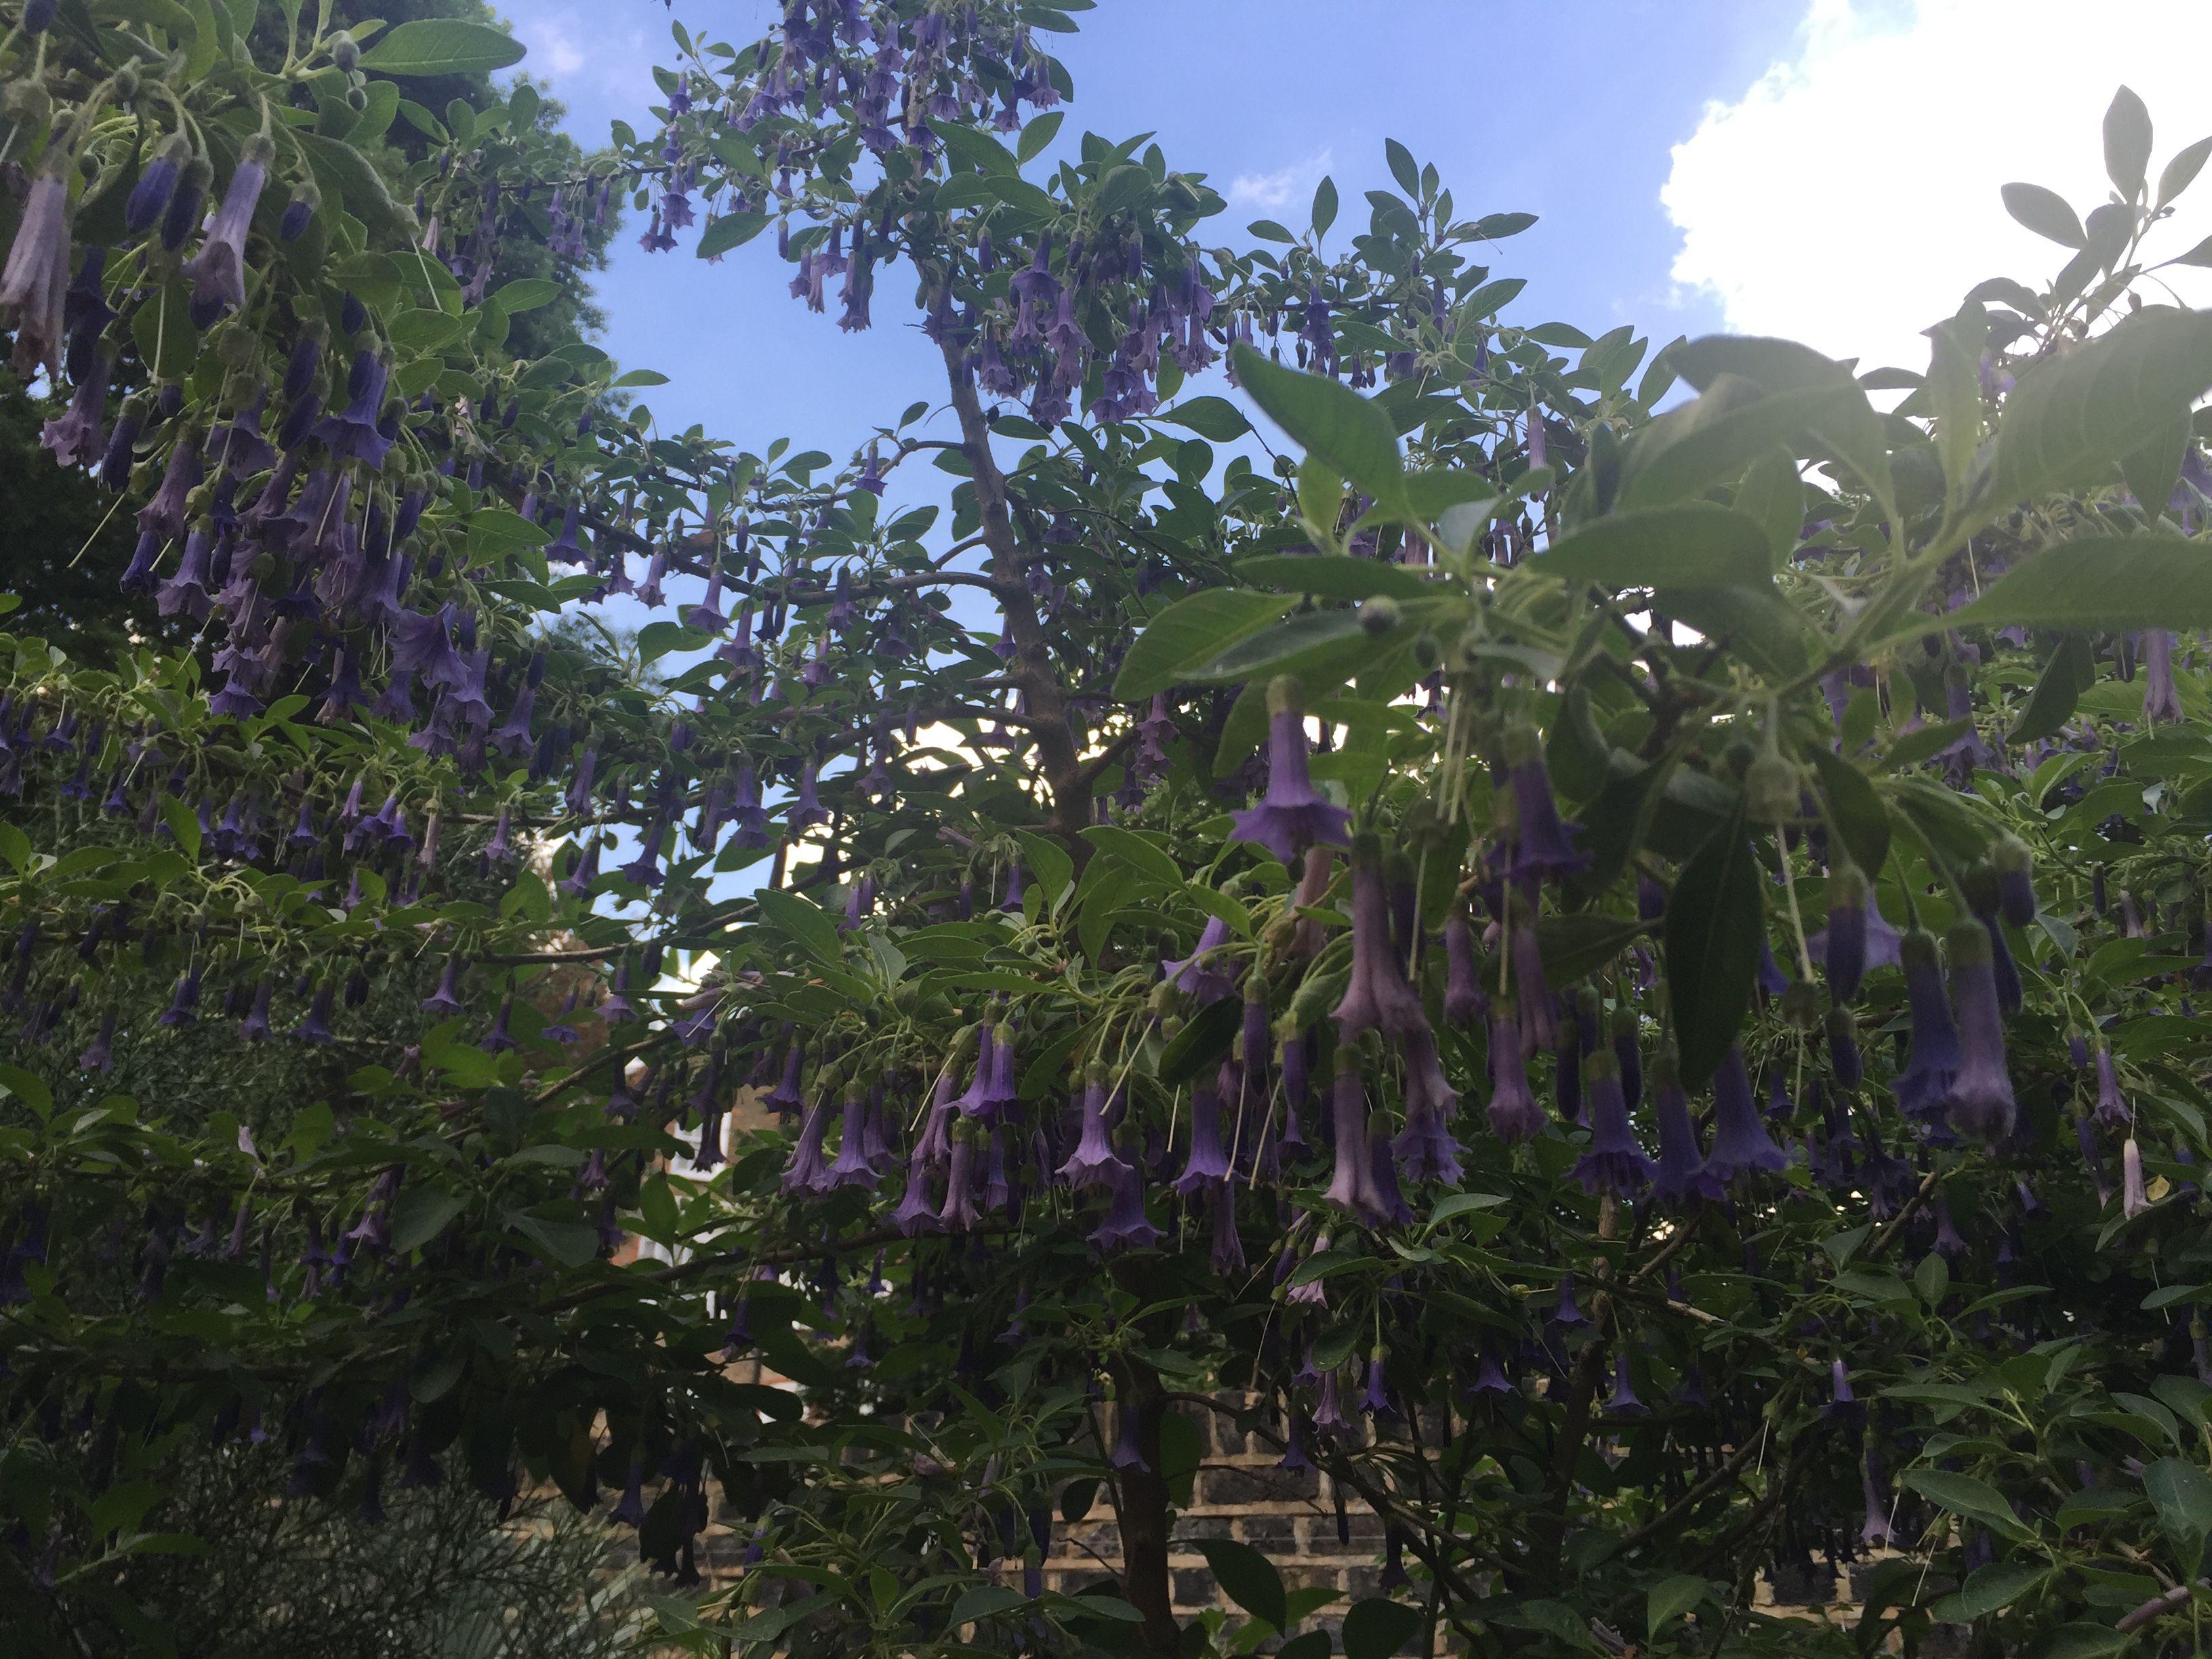 Chelsea physic gardens blue trumpet plants flowers trumpet